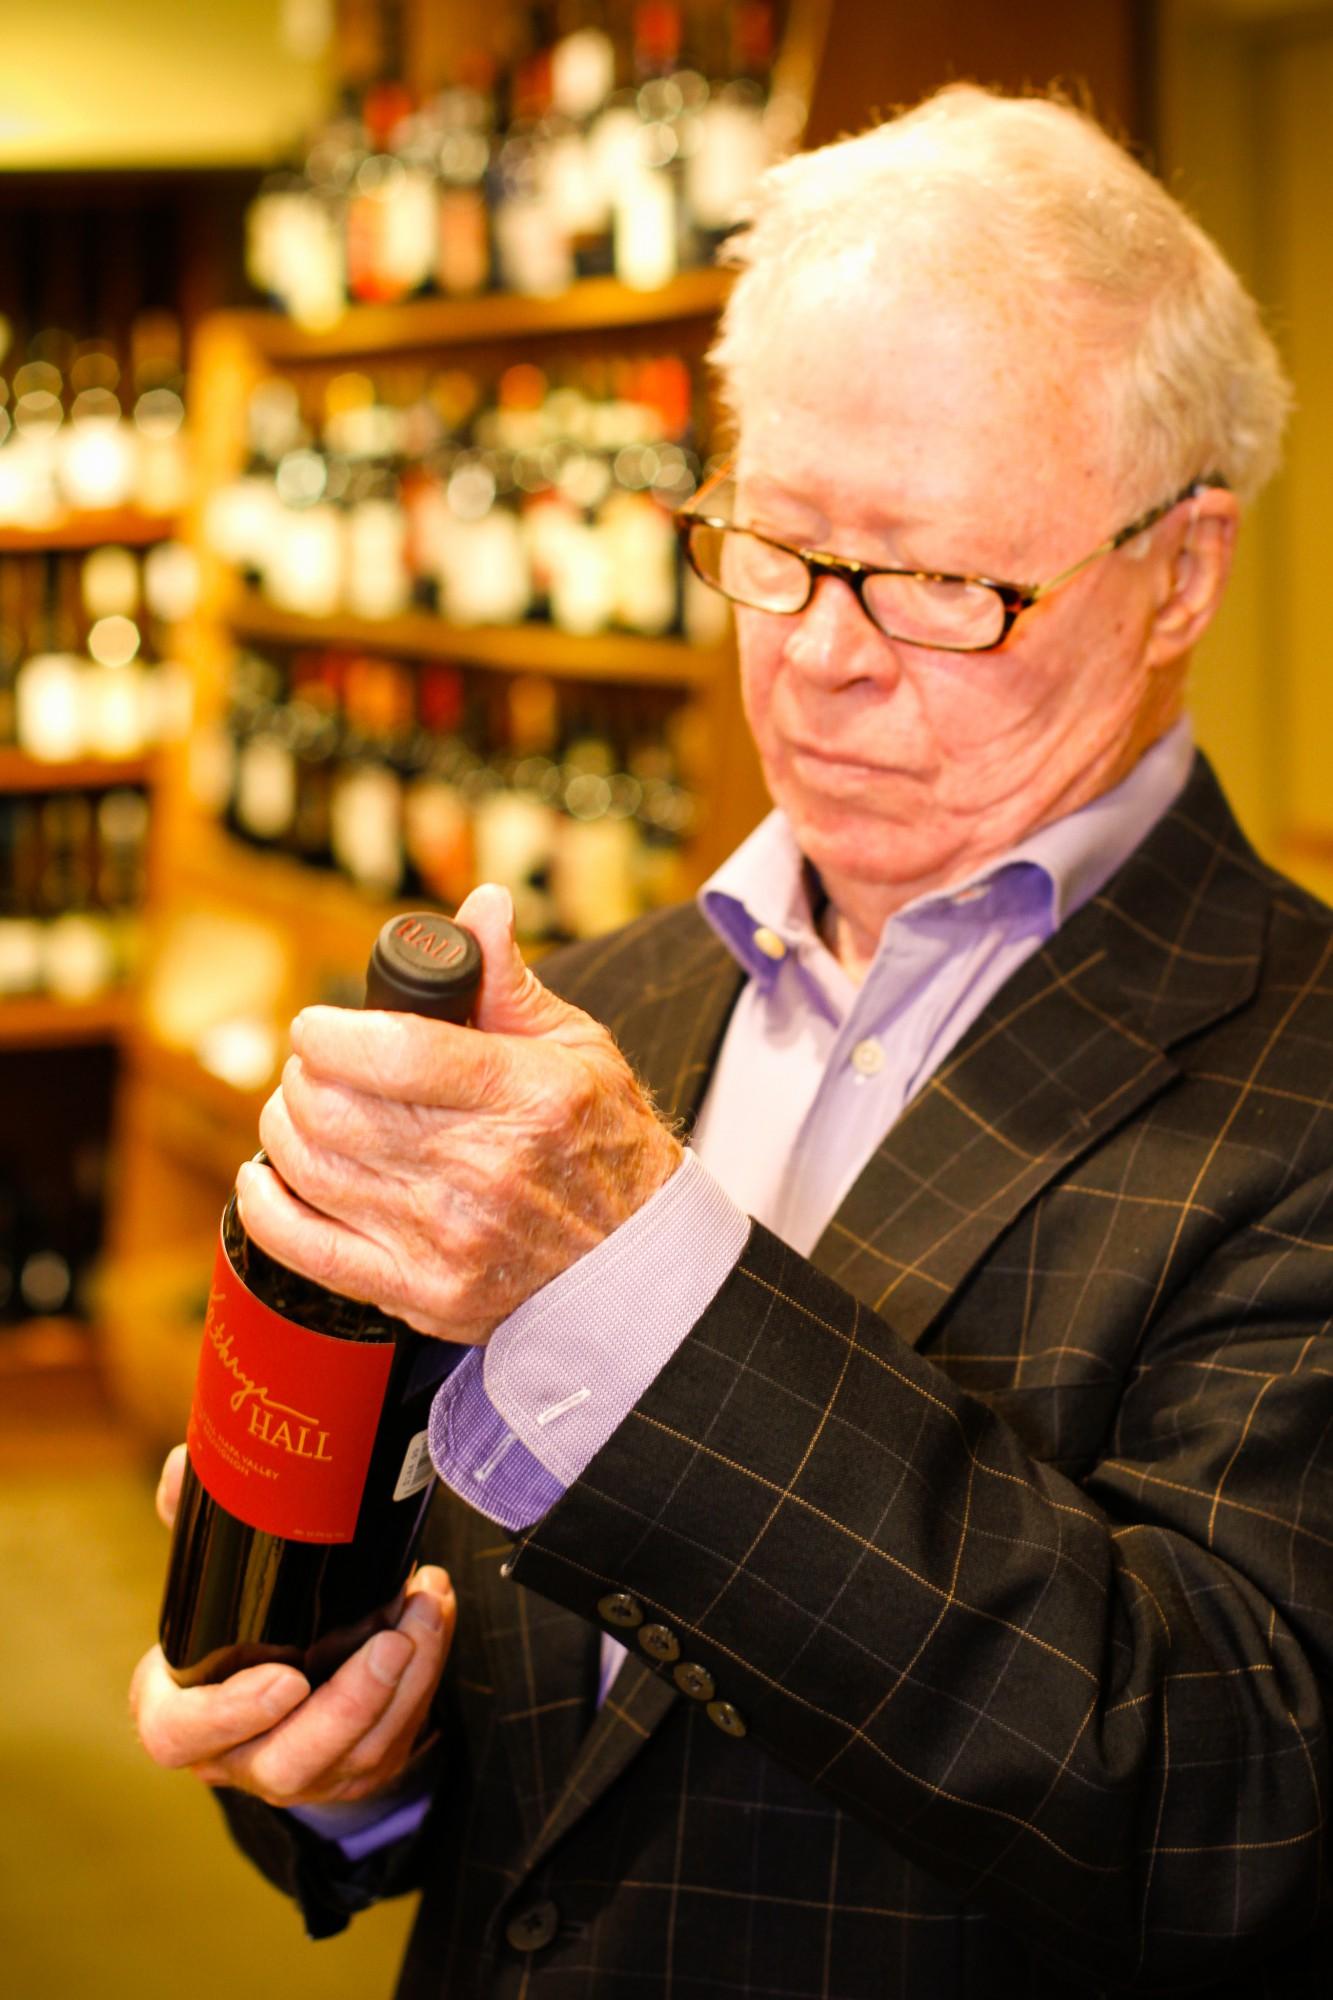 Thomas Power with wine bottle